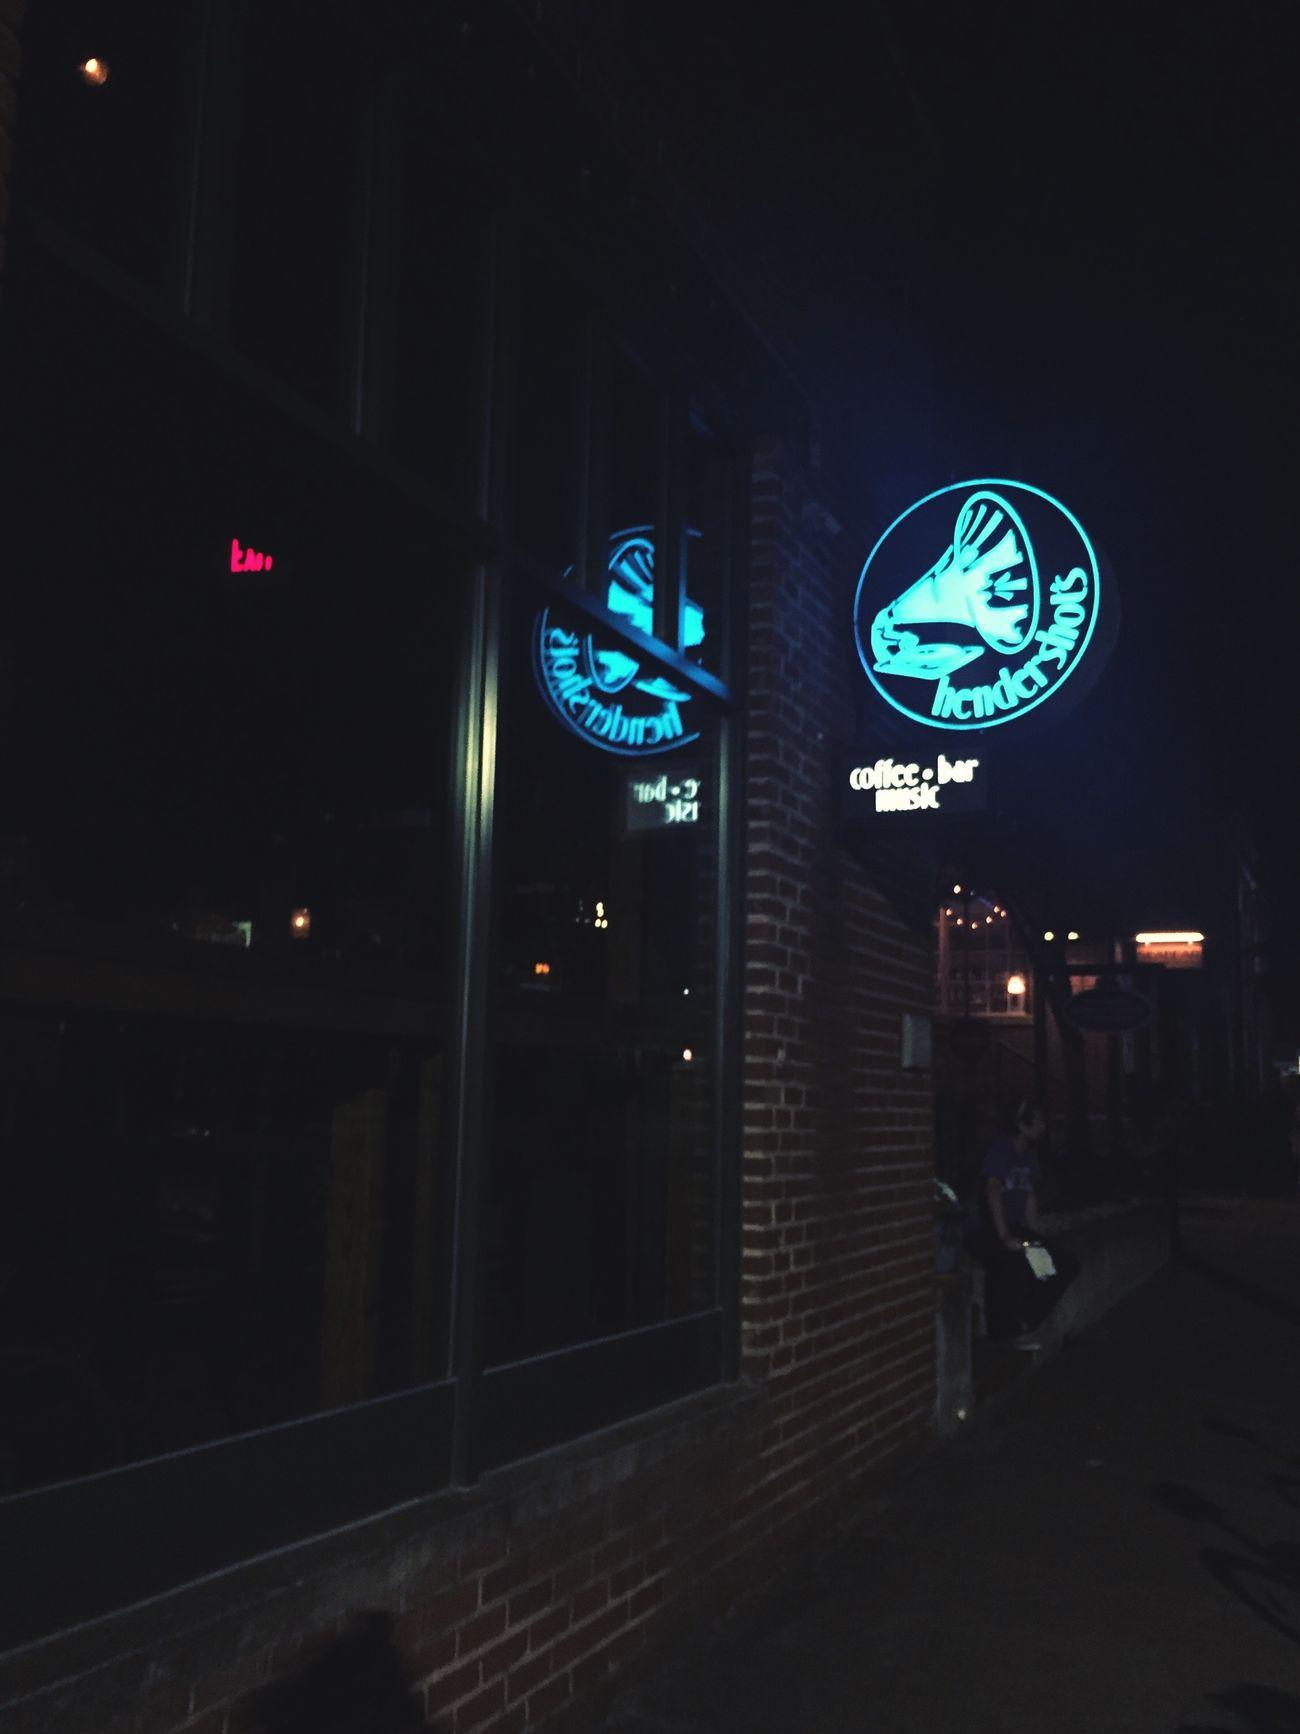 Coffee Bar Grill Open Mic Night Good Music Athens, Georgia Calm